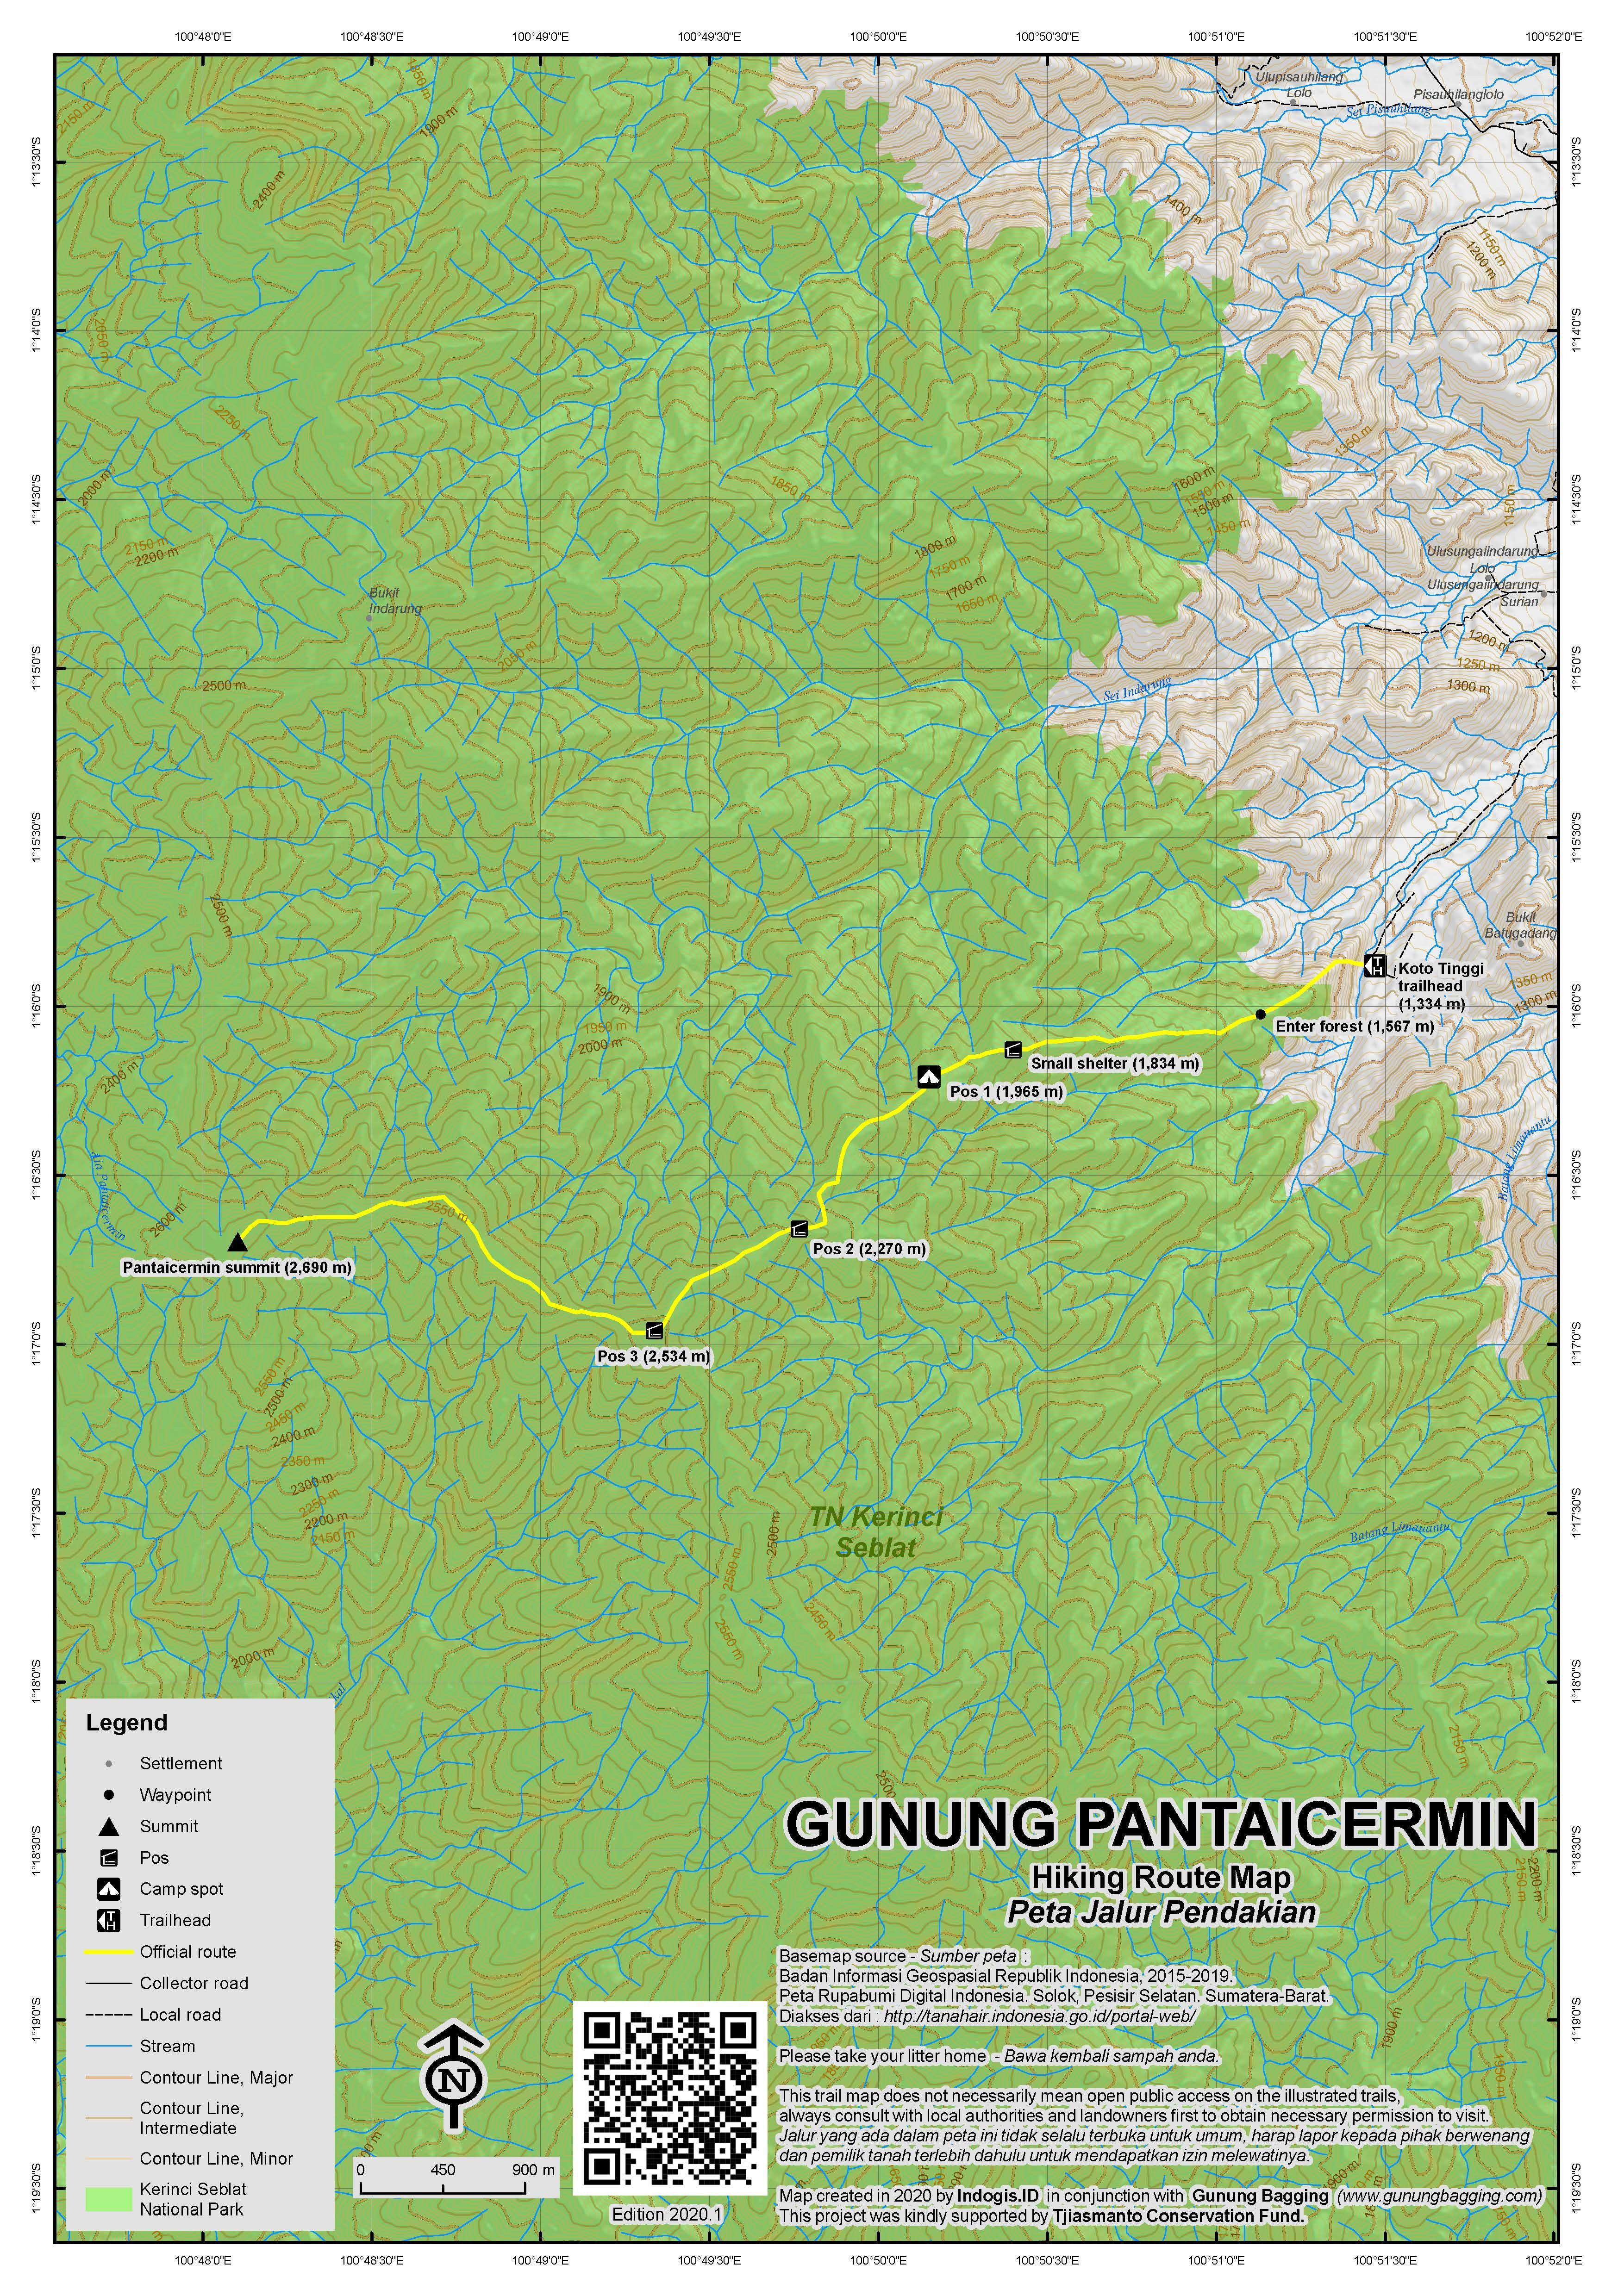 Peta Jalur Pendakian Gunung Pantaicermin